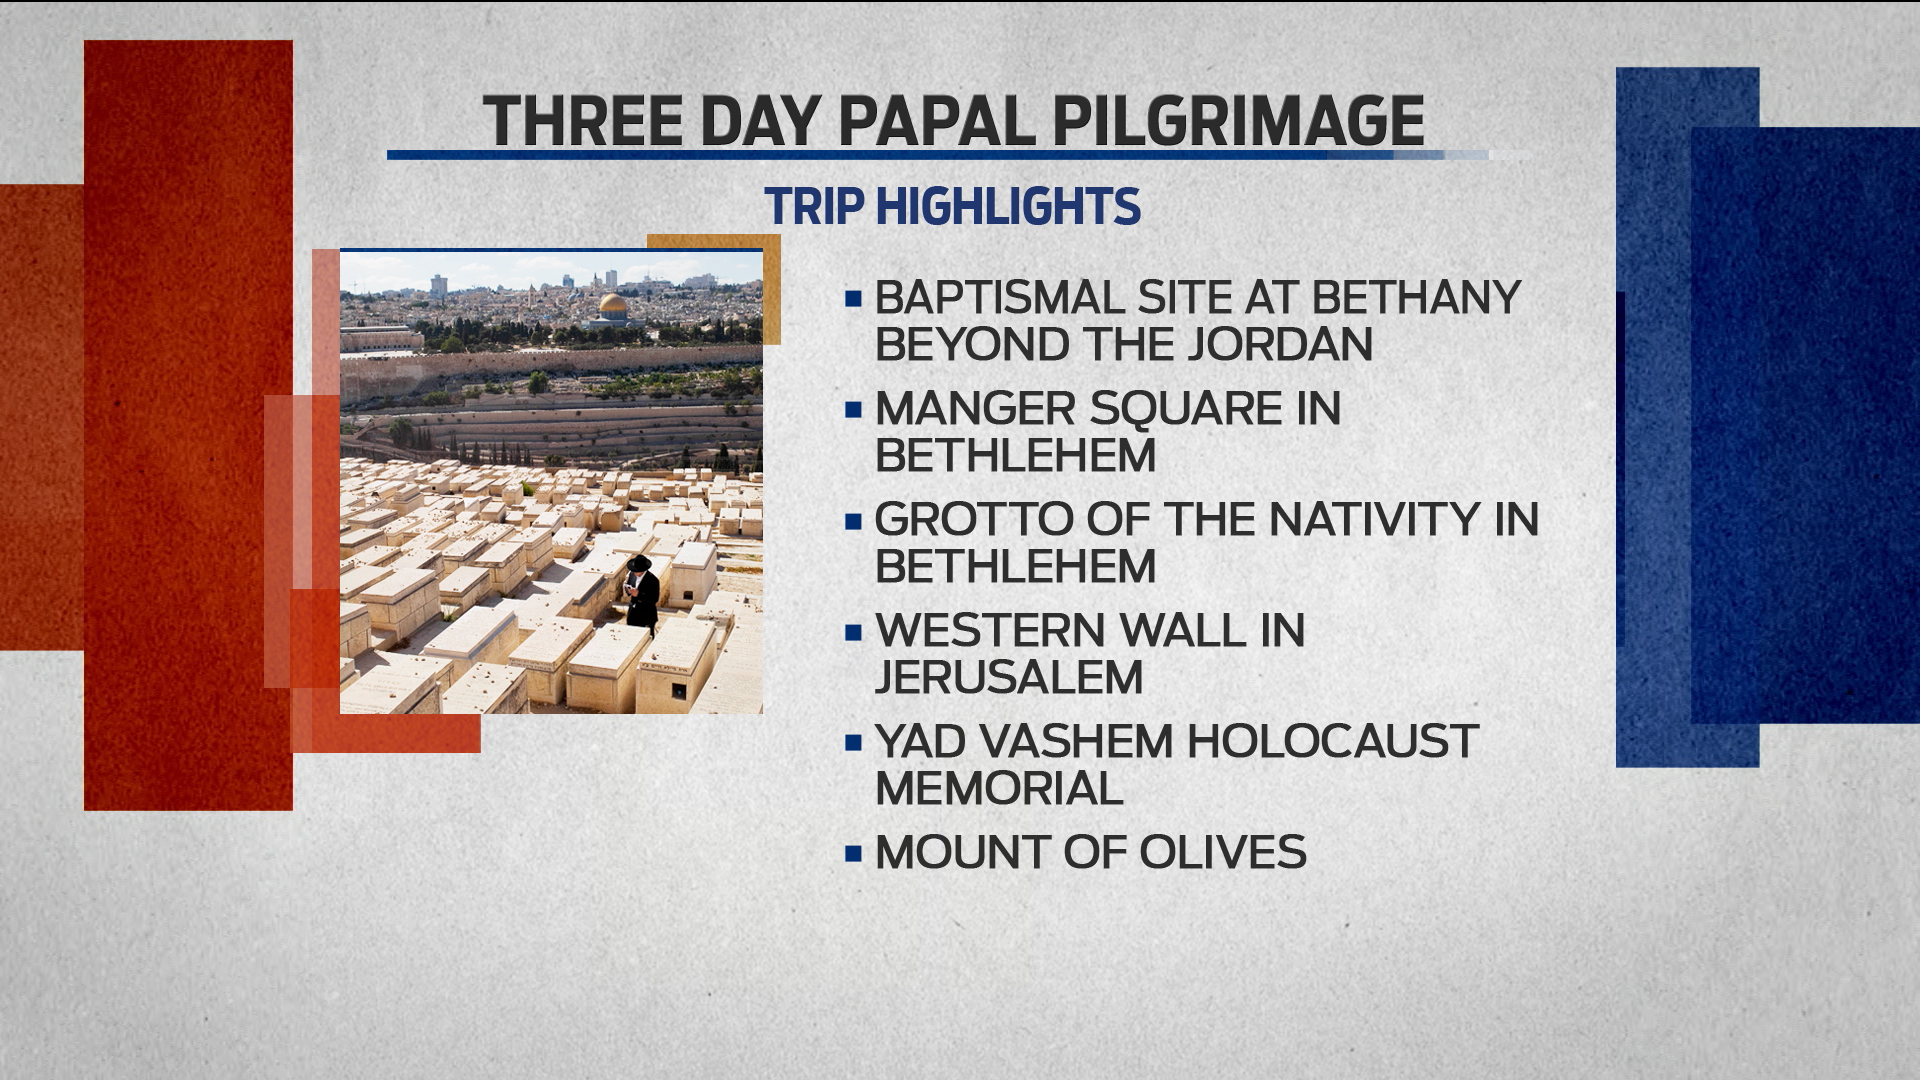 Pope Francis' historic pilgrimage